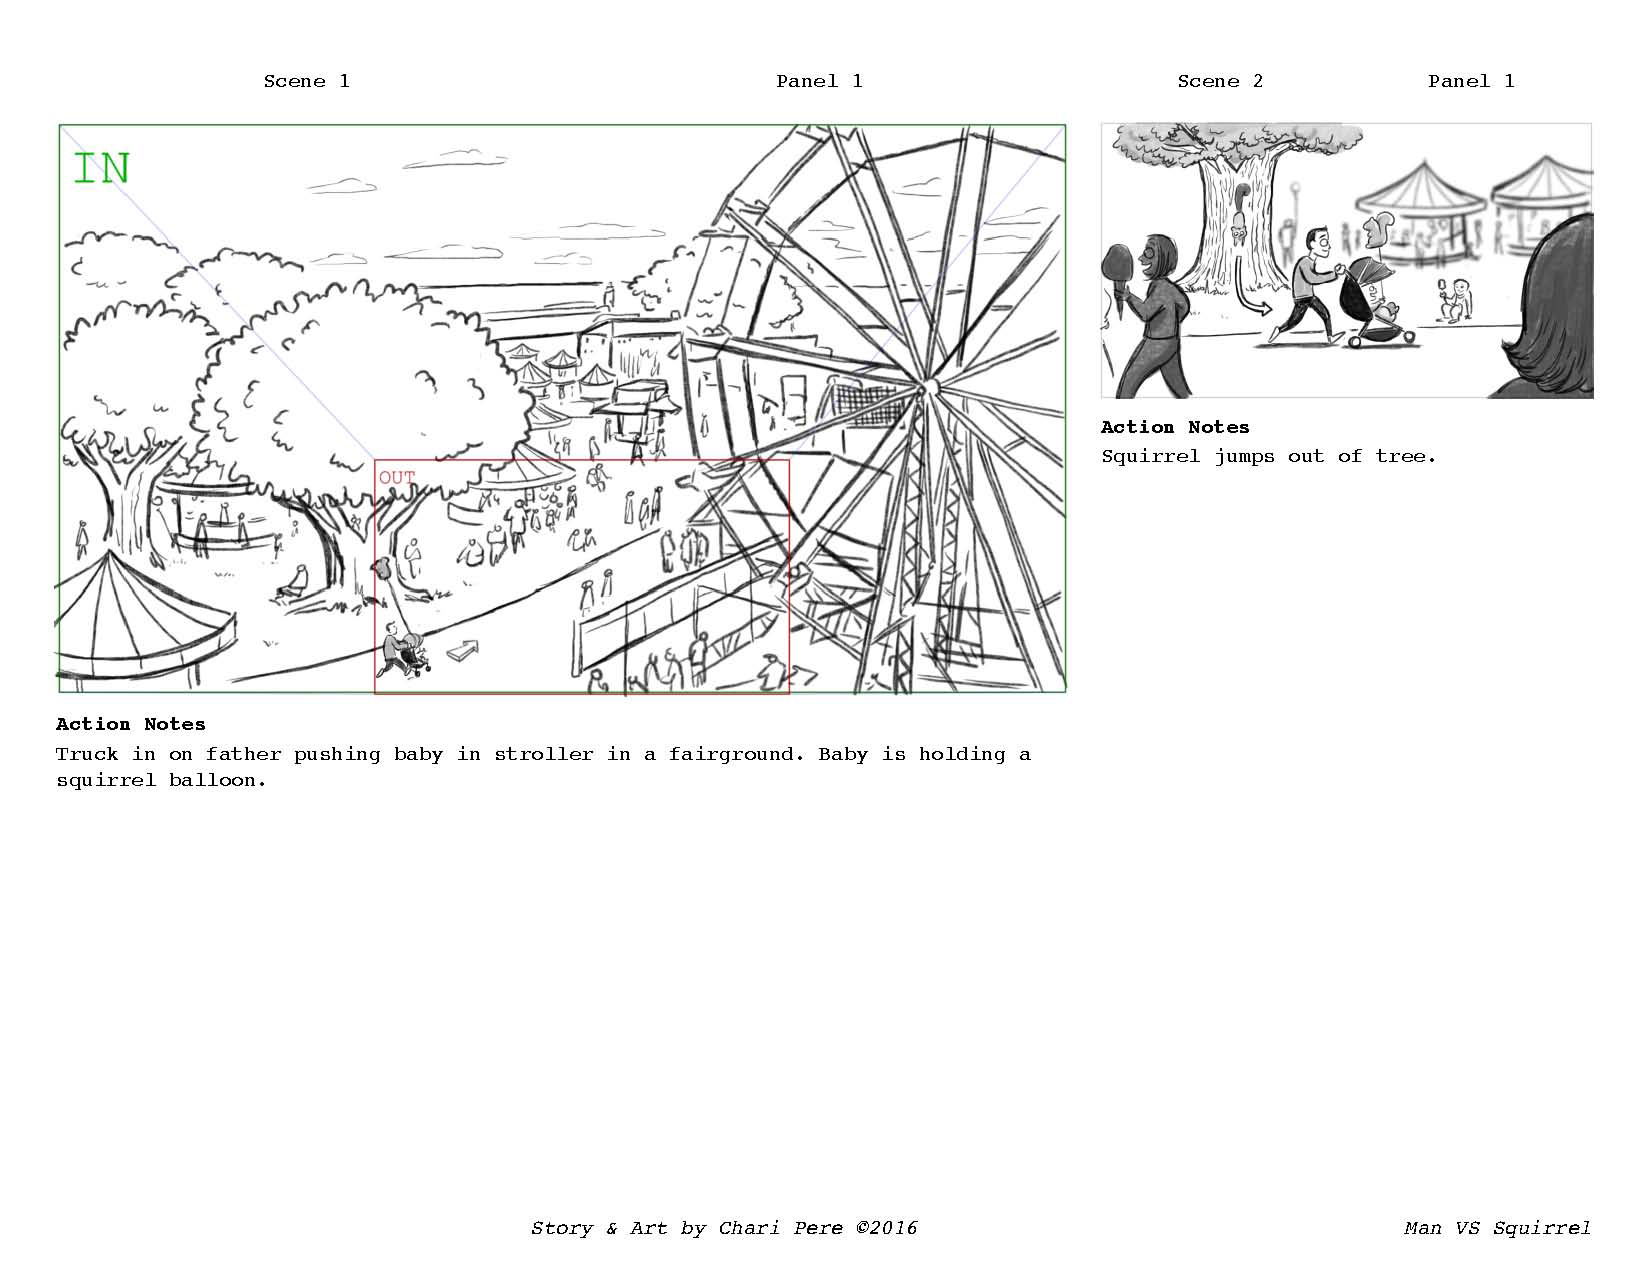 Man VS. Squirrel Storyboards, Page 1